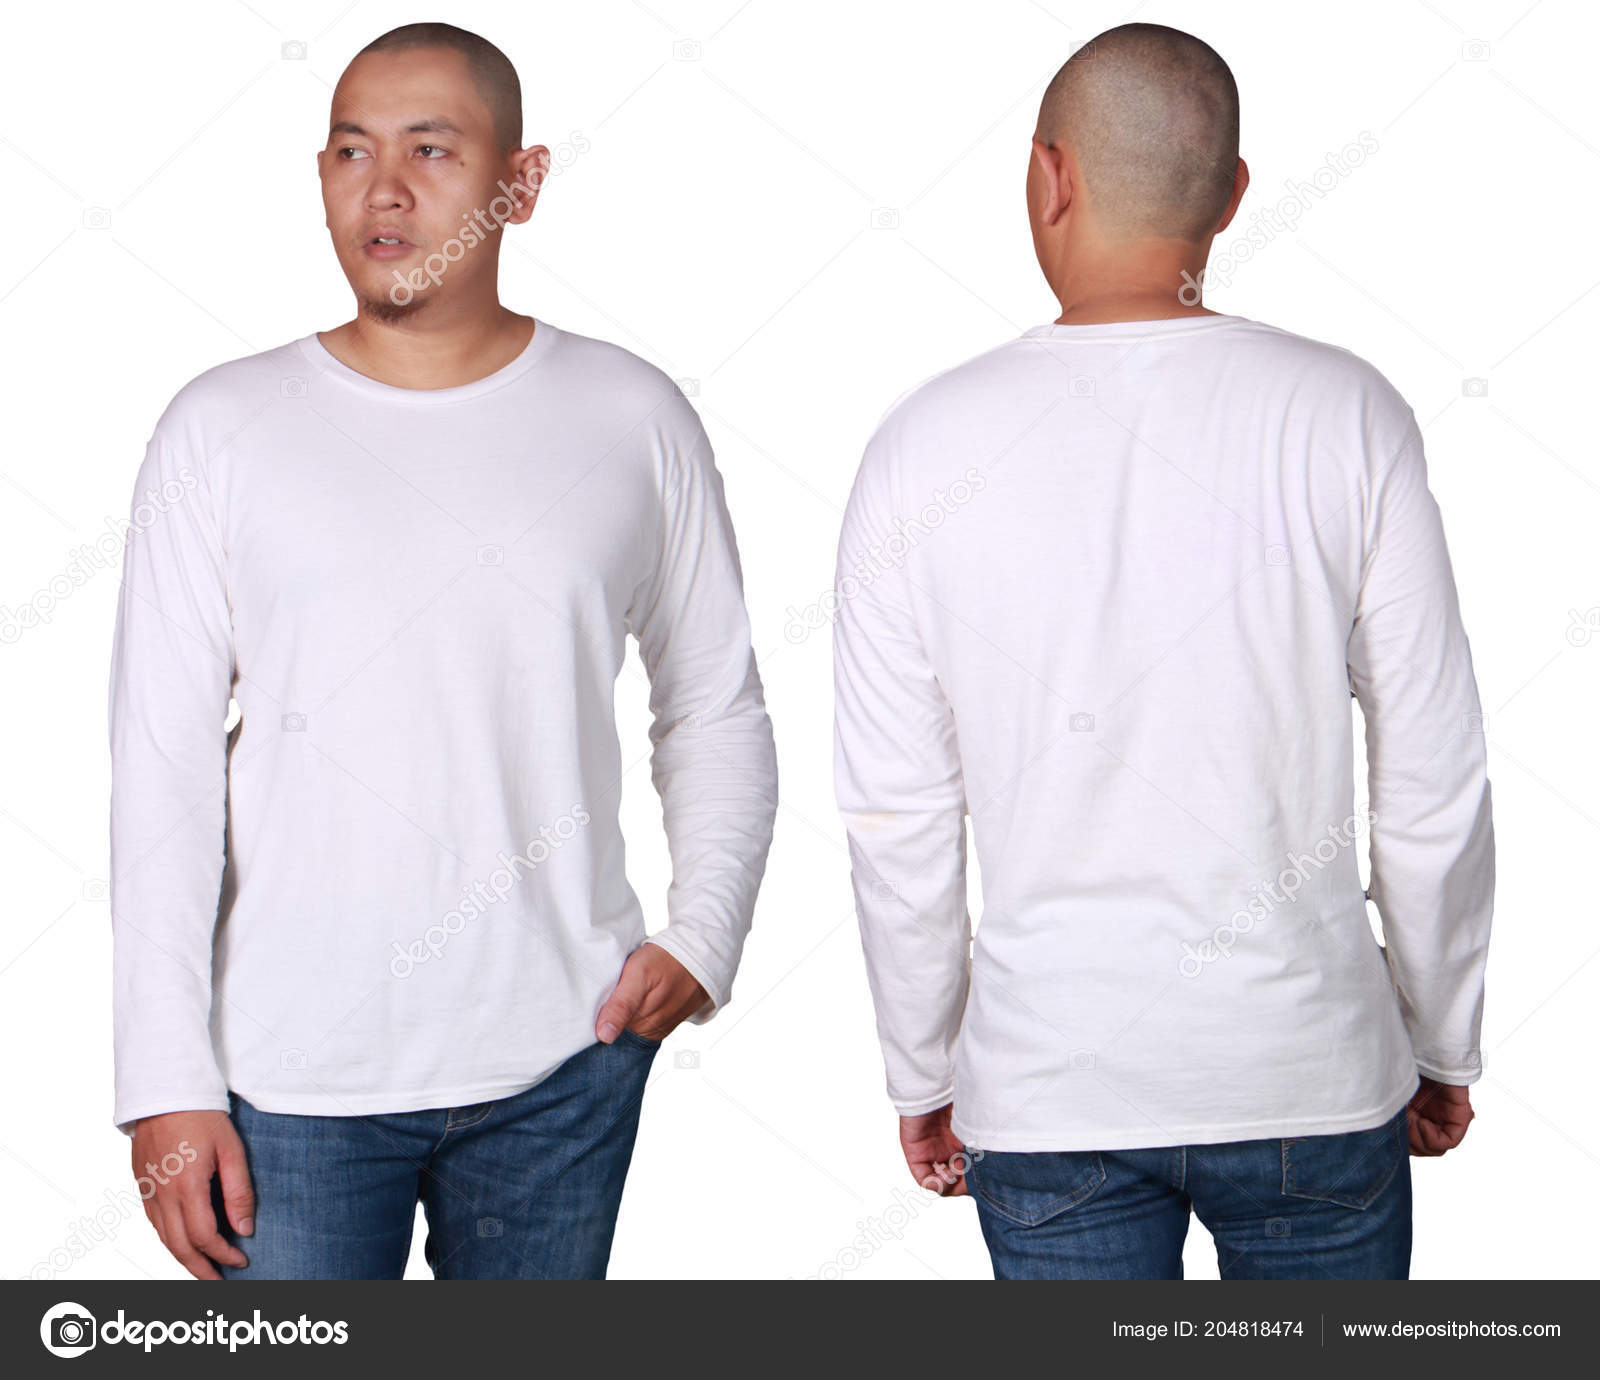 5a98e0777 Camiseta Manga Comprida Branca Mock Frente Costas Isolado Maquete ...